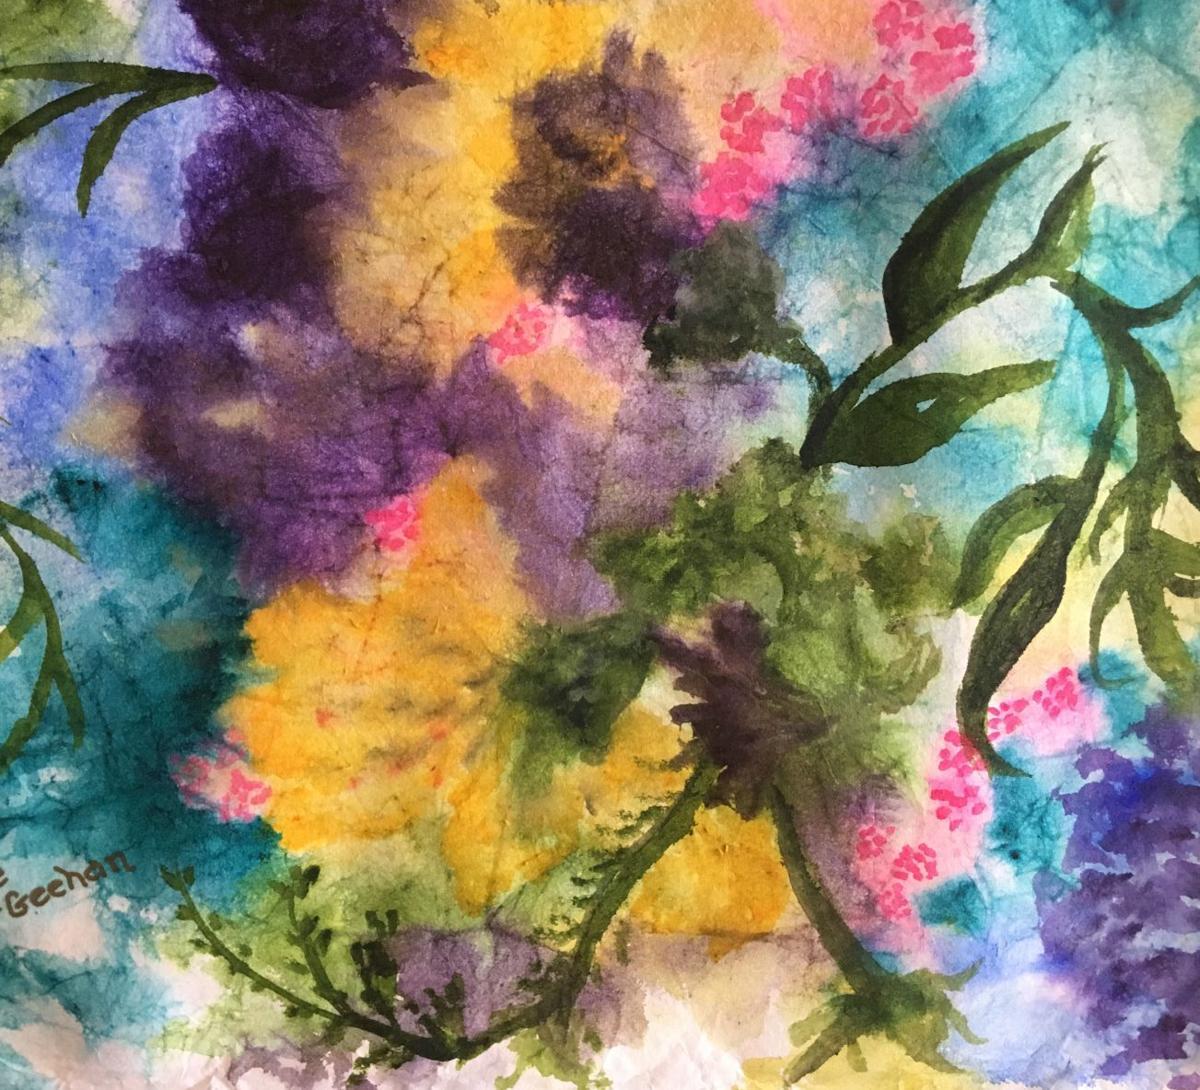 Work by Jane McGeehan